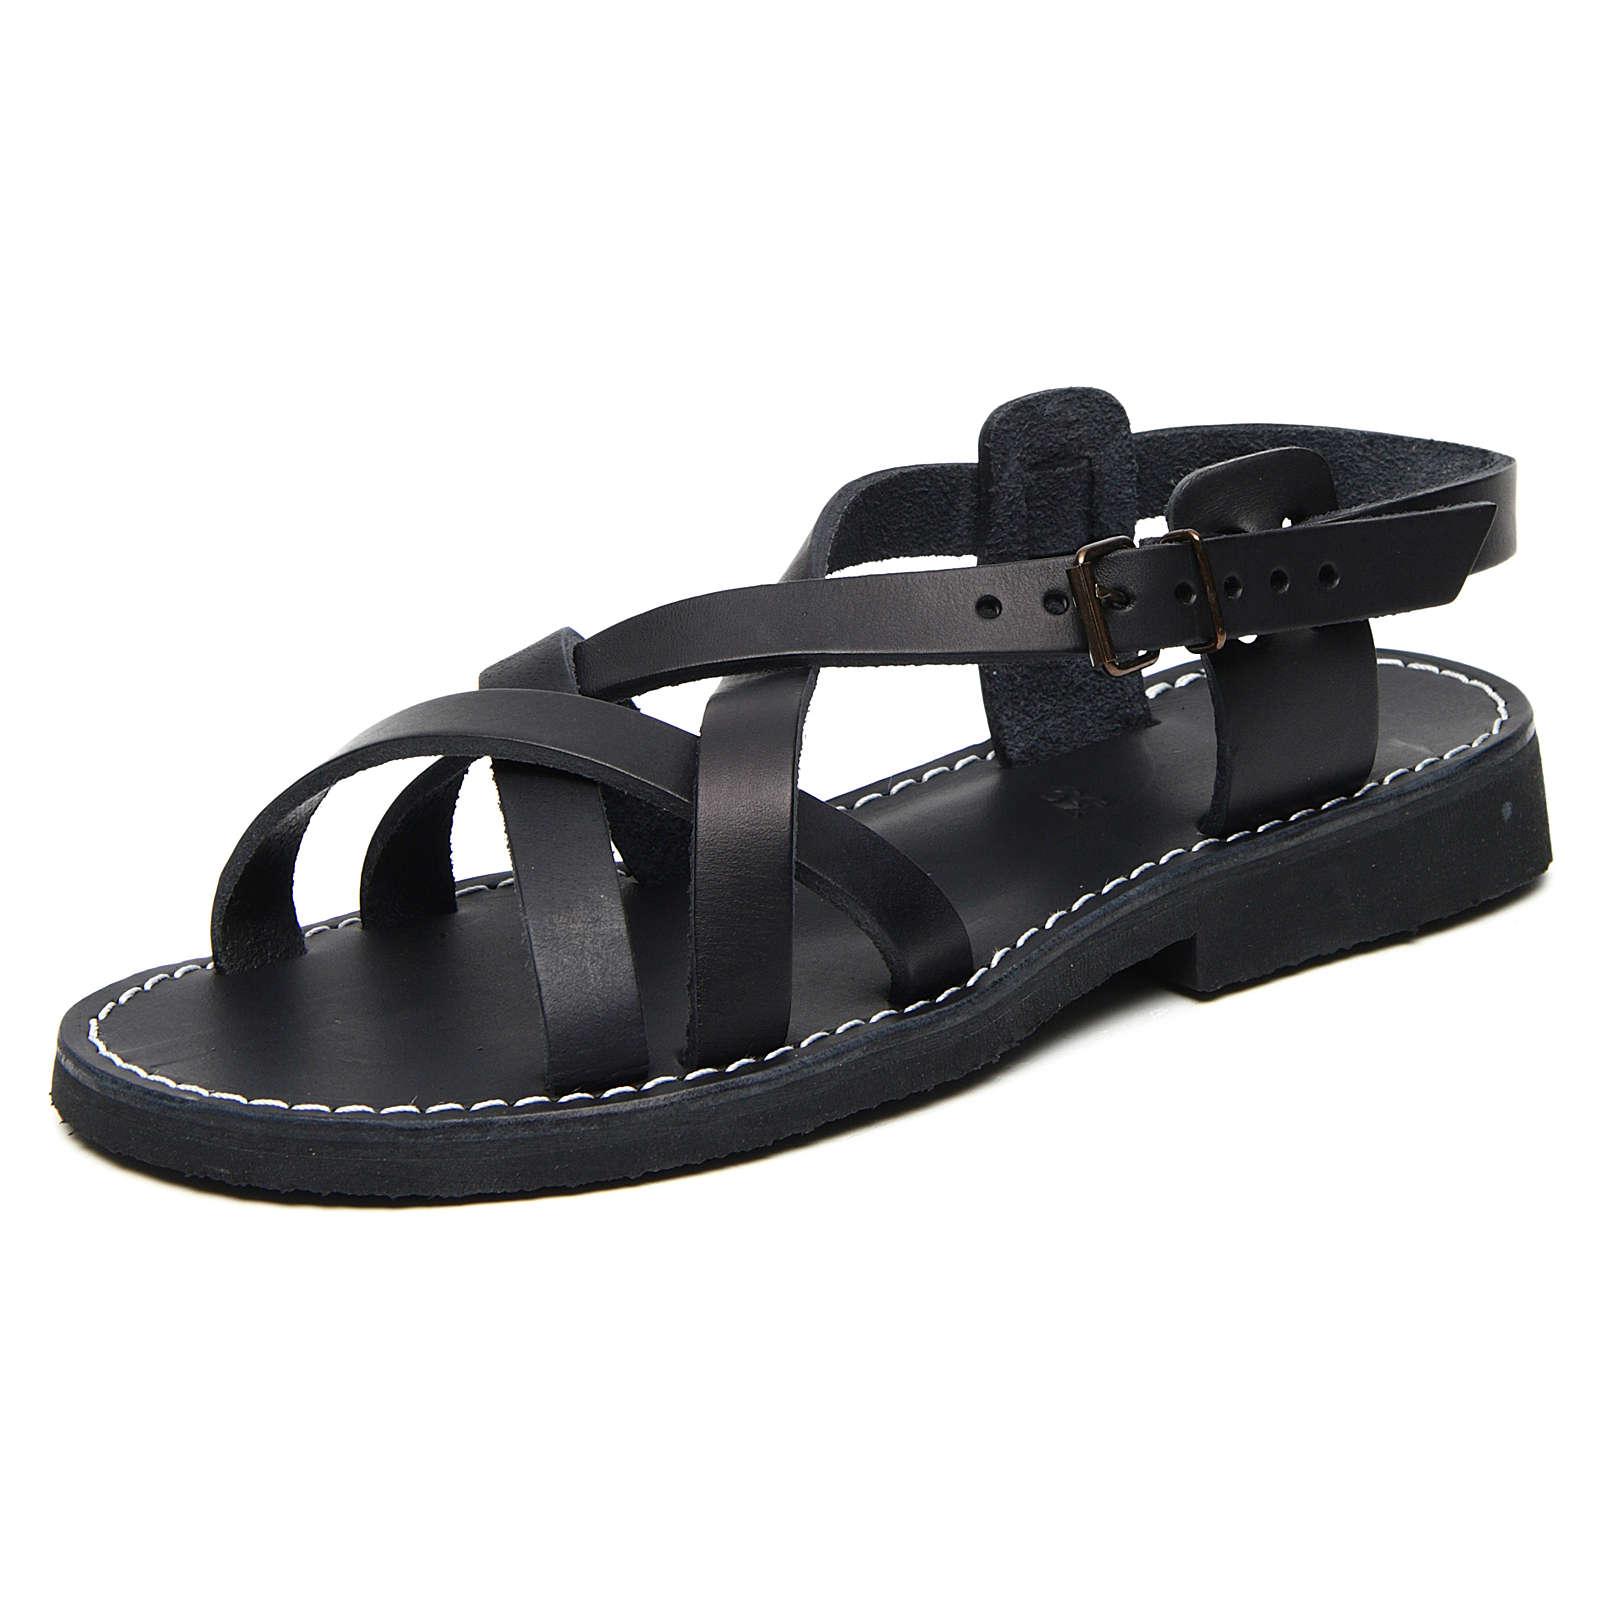 Sandales bénédictins cuir mod. Samara Moines de Bethléem 4